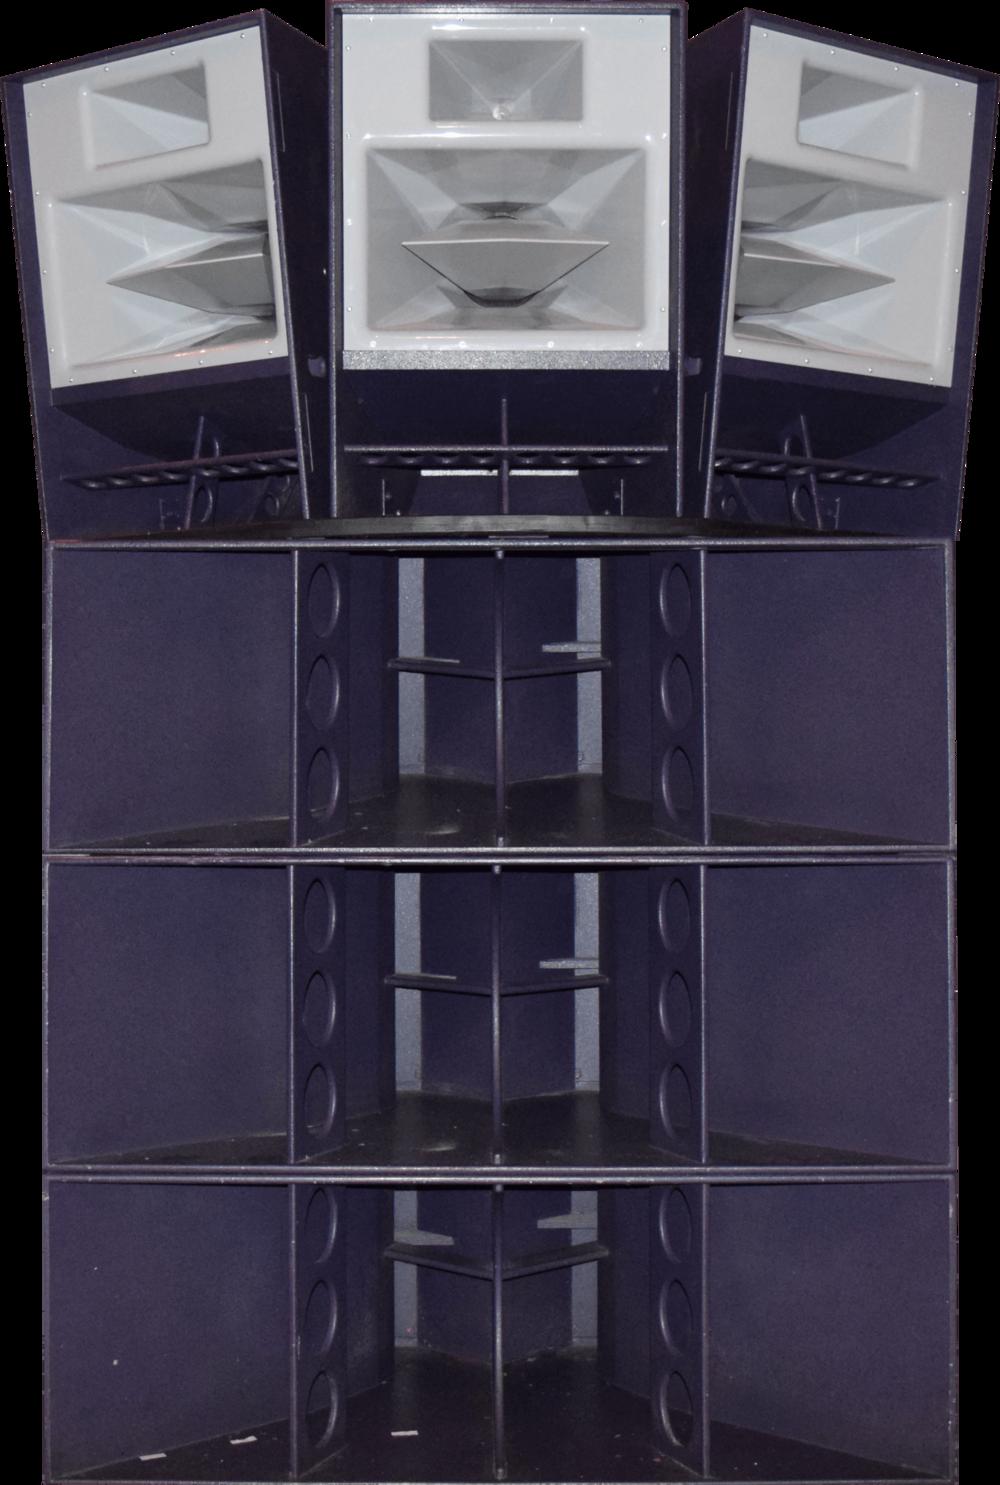 Funktion-One-Speaker-Stack-F221-EVO-7-1347x2000.png